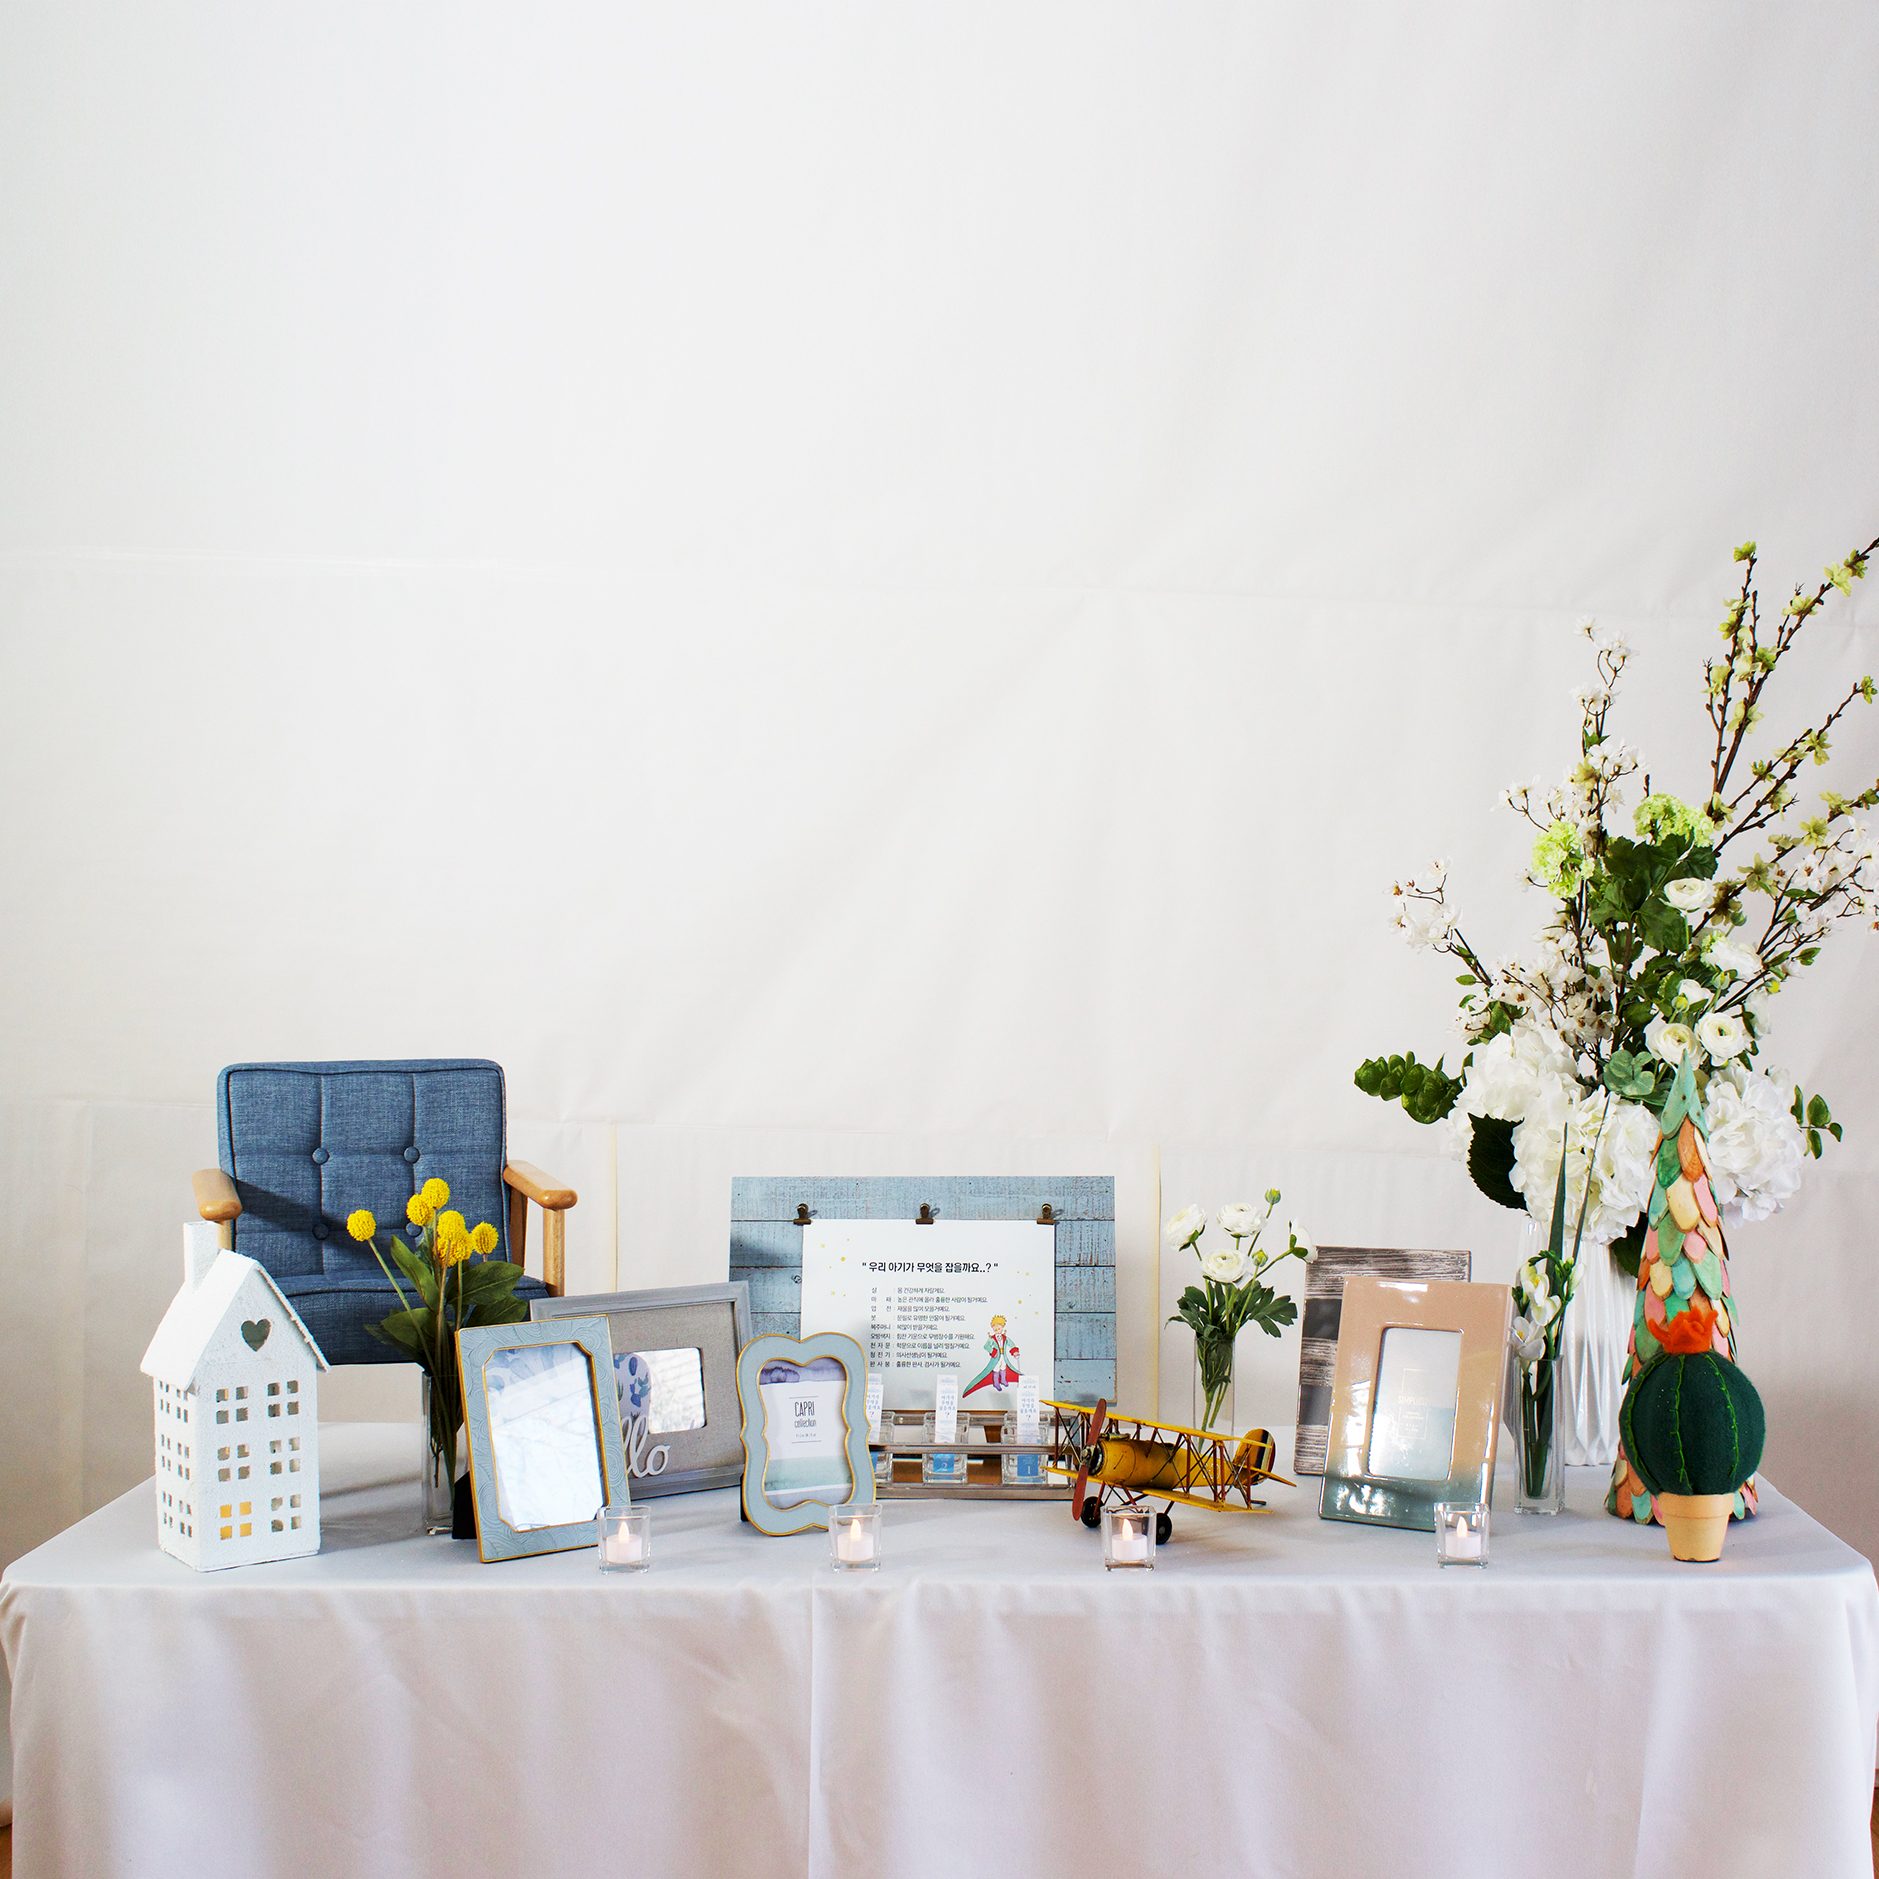 little princephoto table - Included: mini chair, 5 picture frames, airplane, house, tree, pastel tree decoration, flowers and vases, 4 mini candle holders상품구성: 미니의자, 액자 5개, 비행기, 집, 나무, 파스텔 나무 장식품, 꽃들과 꽃병, 데코초 4 개, 돌잡이표